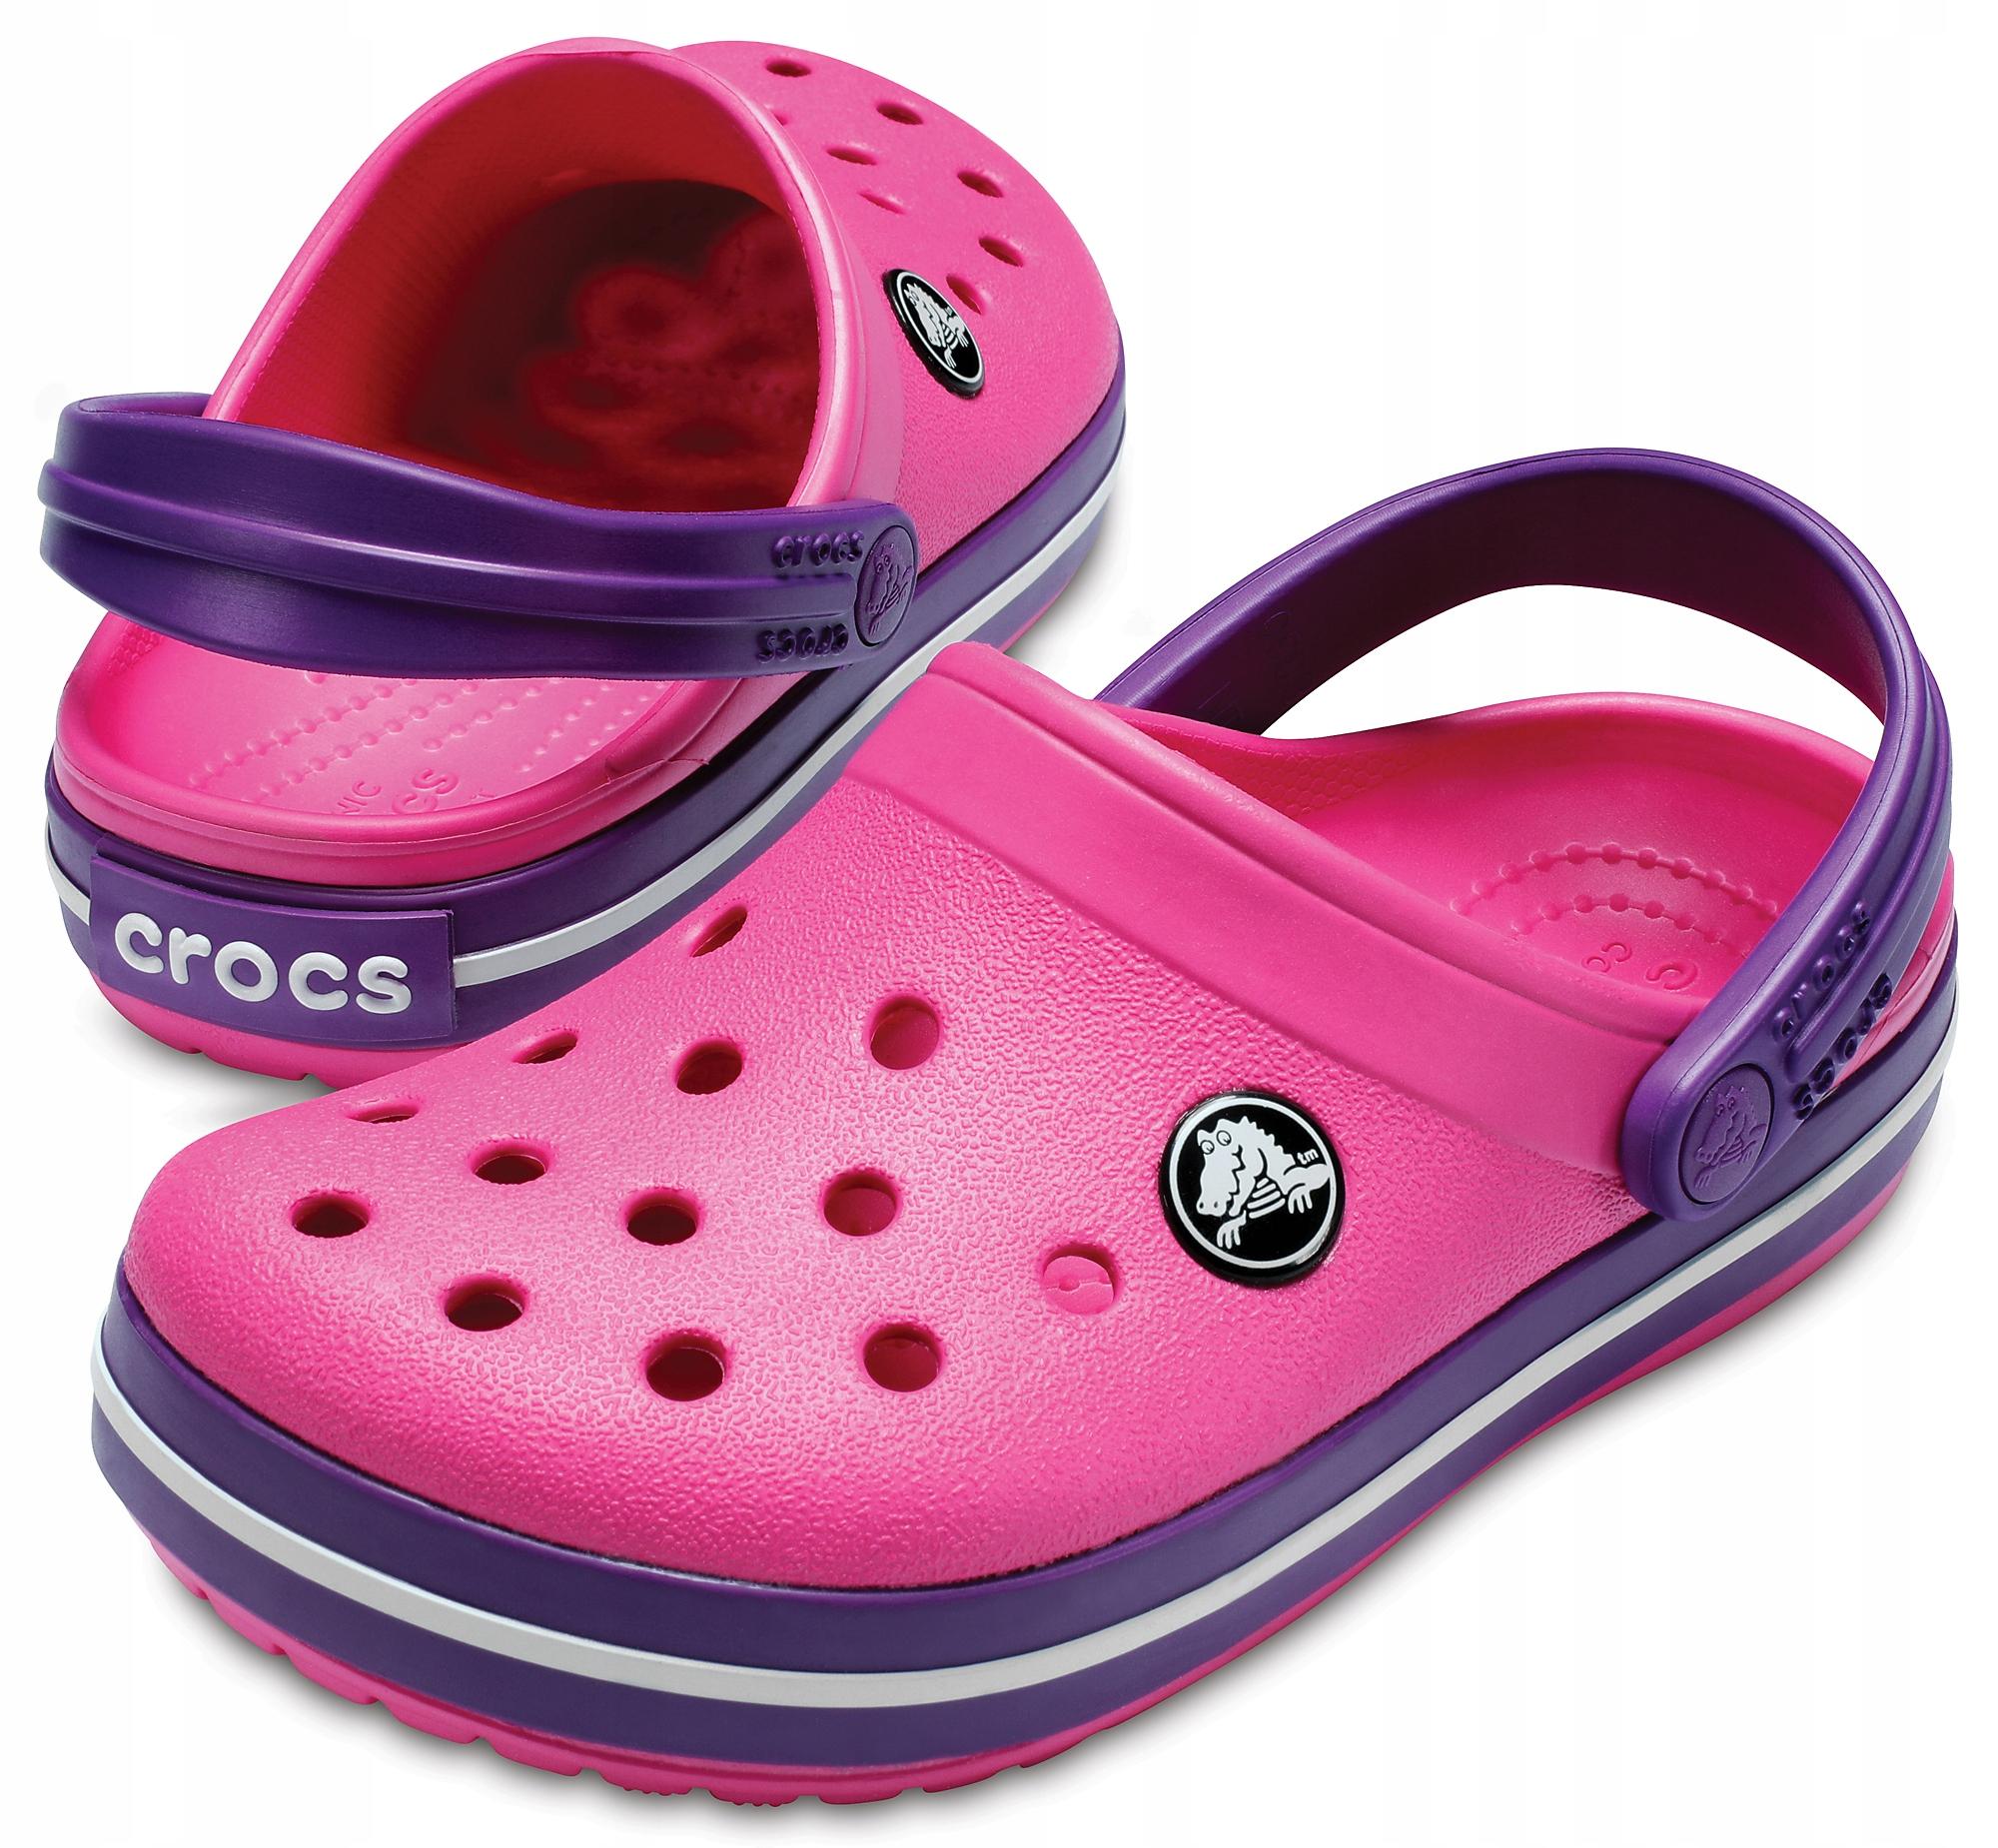 Crocs Crocband 204537 Clog J2 33 34